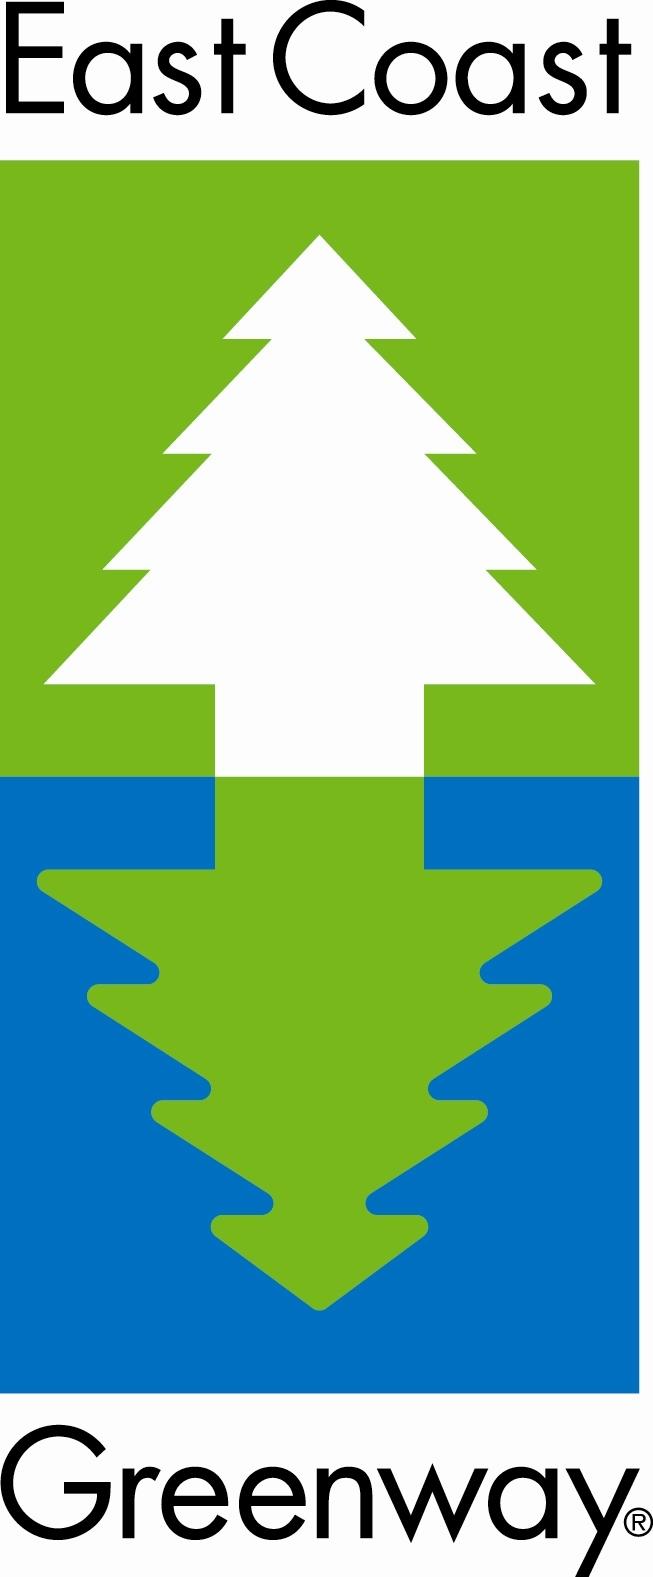 East Coast Greenway Sign 2